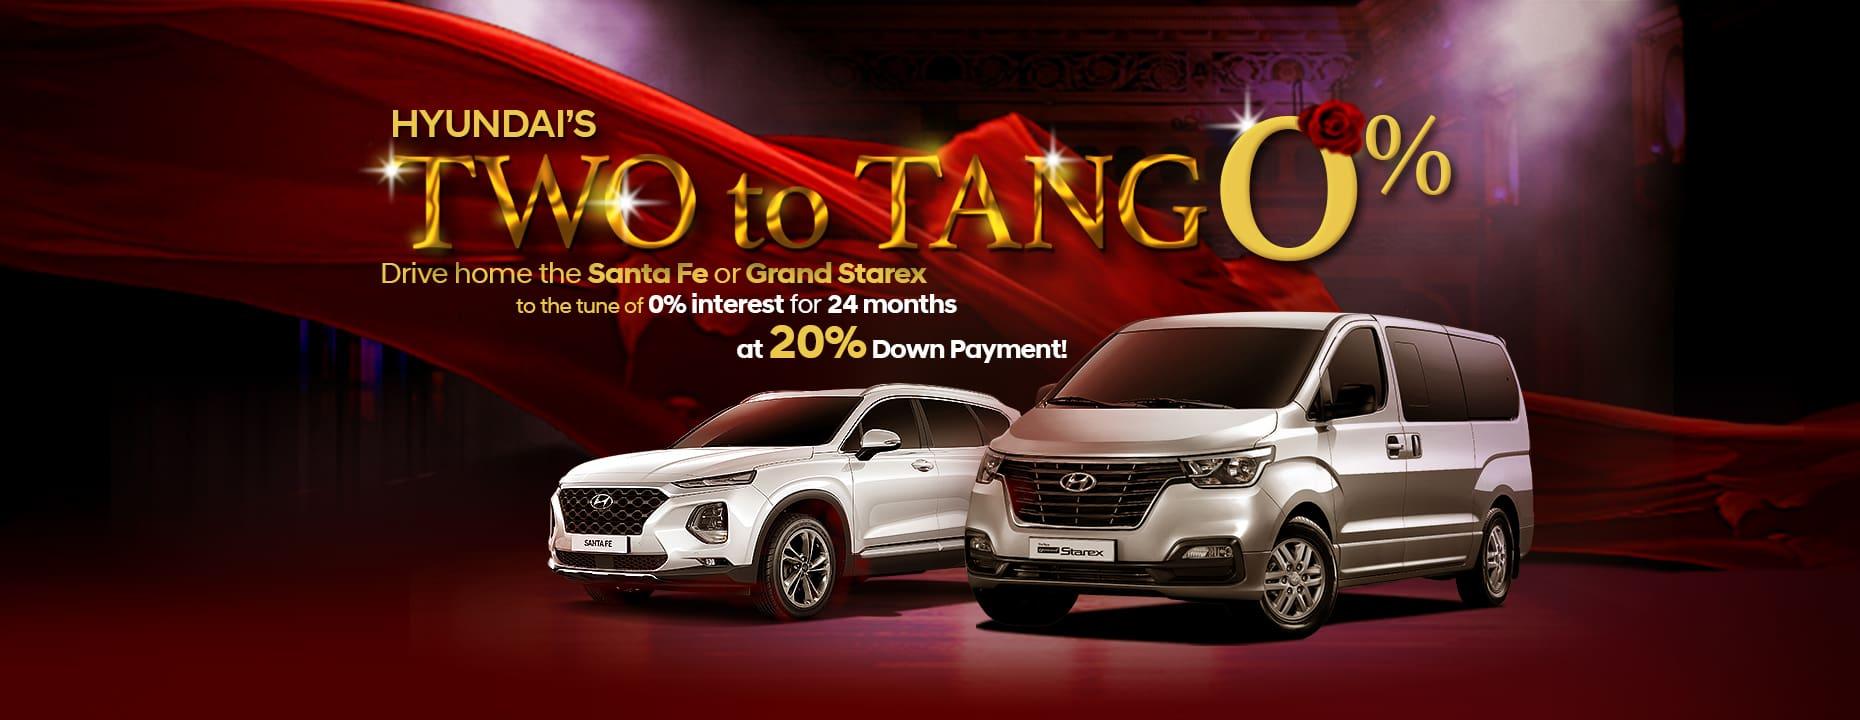 Dance To Hyundai's 'Two to Tango' Promo